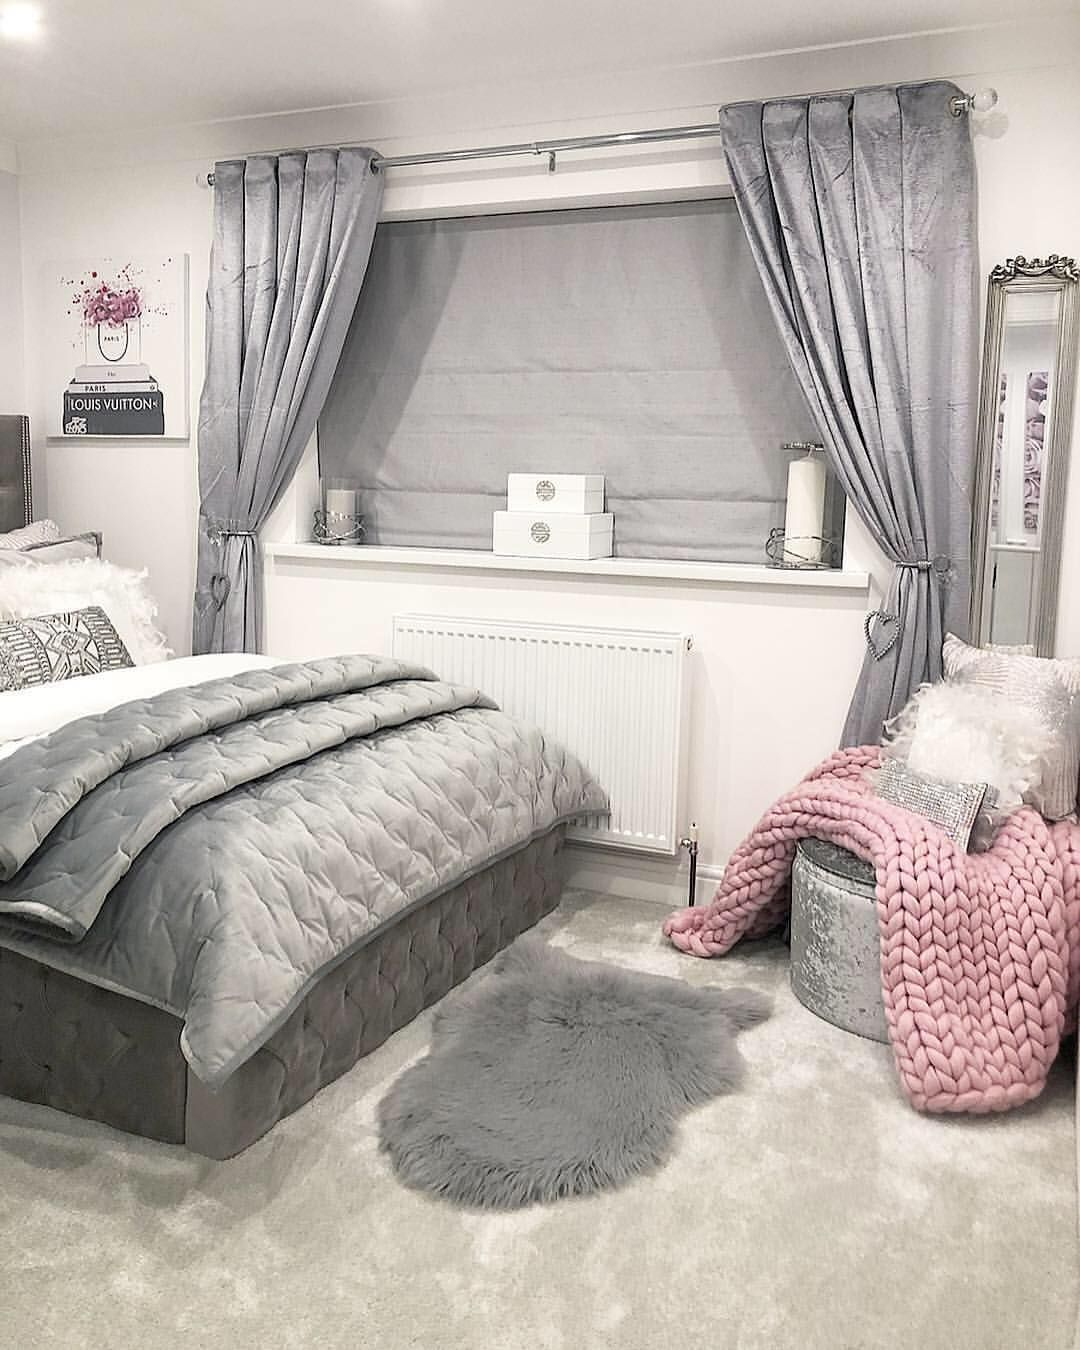 Innenraum Dekor Inspo No40 Home Renovation Instagram